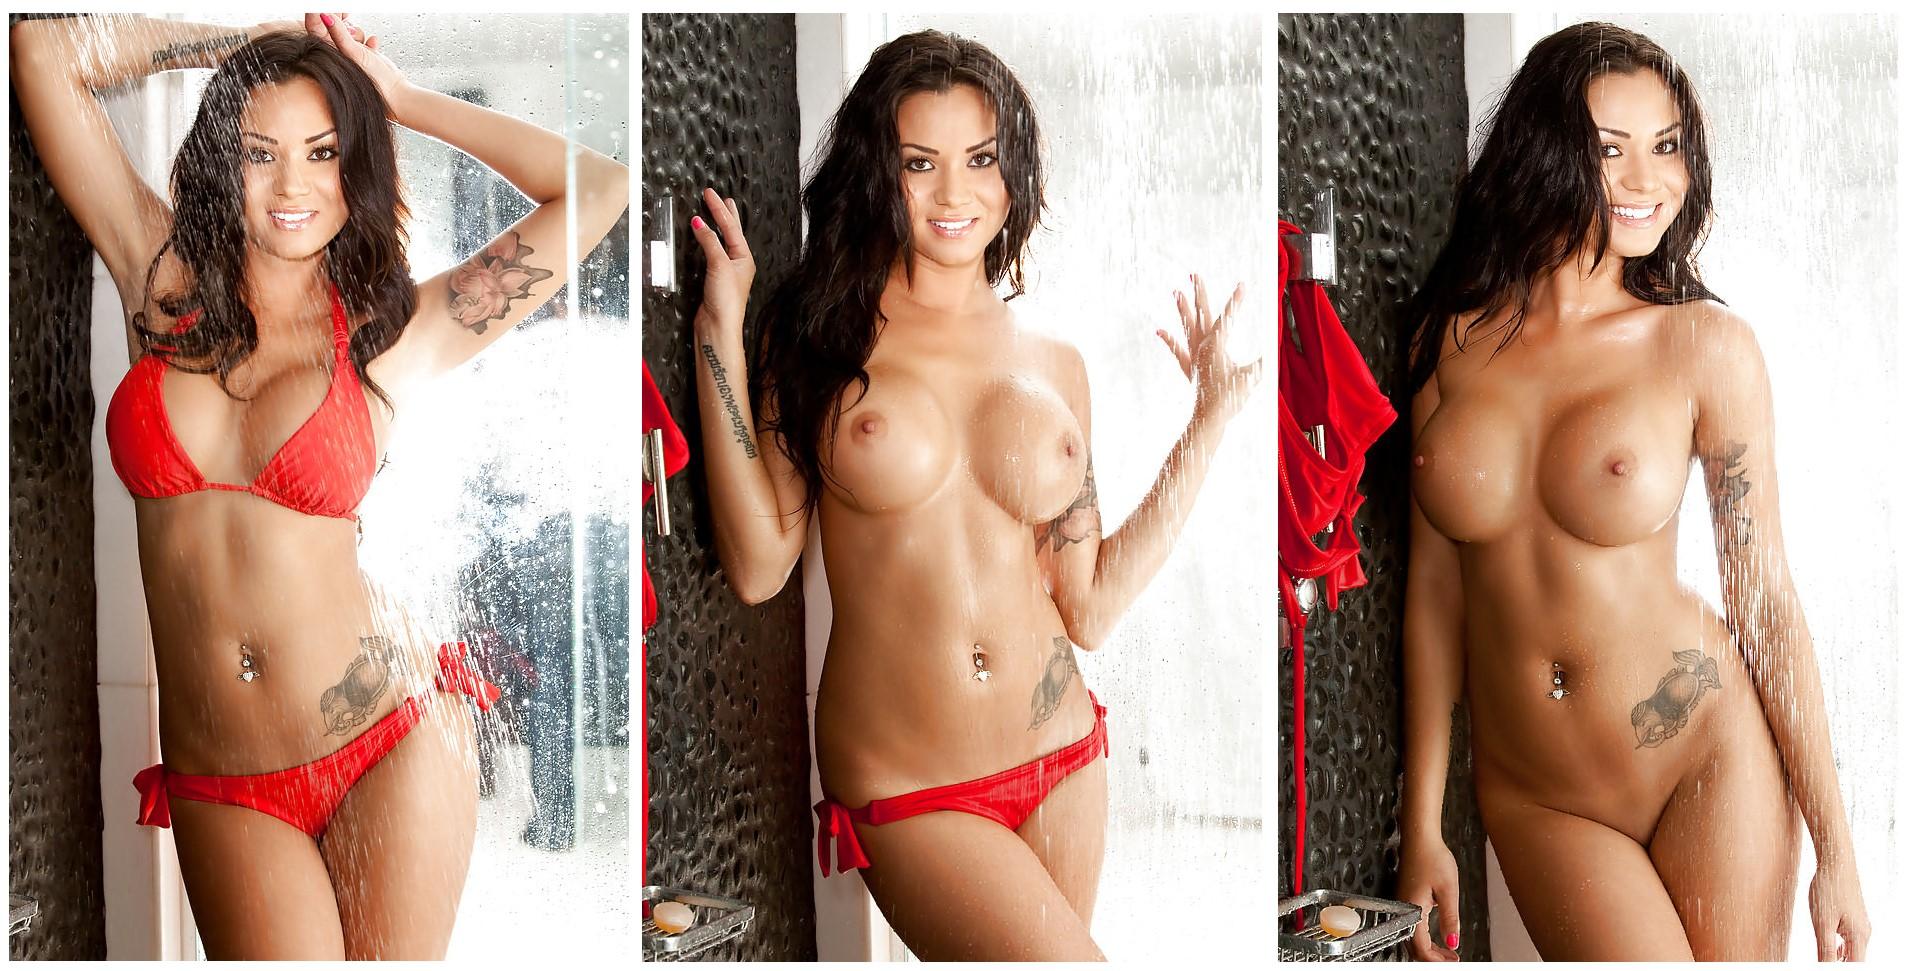 Amy Reid Porn Brother jennie reid in the shower porn pic - eporner